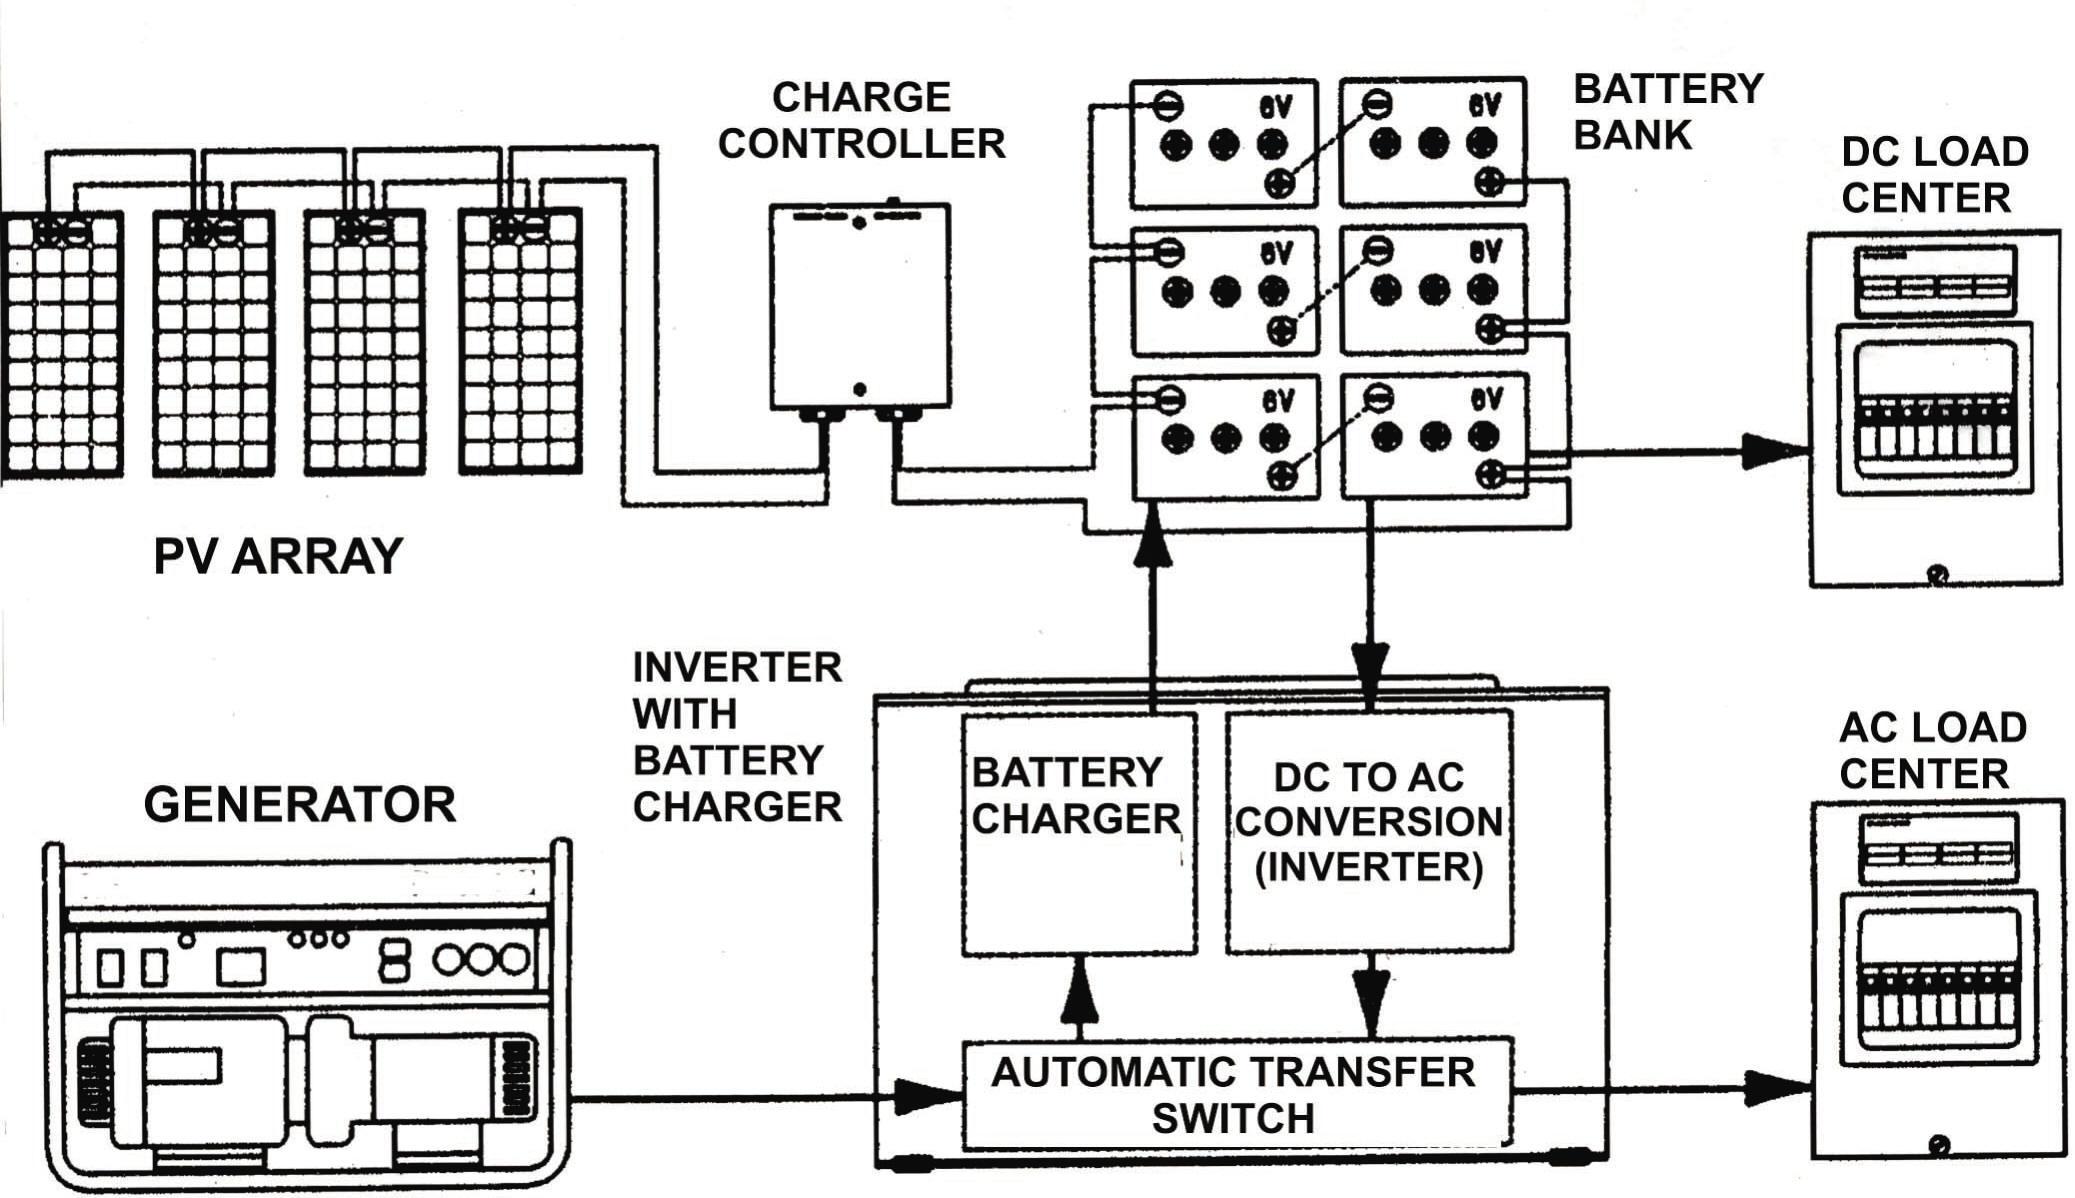 inverter charger wiring diagram vf 6228  inverter charger wiring diagram free diagram marine inverter charger wiring diagram inverter charger wiring diagram free